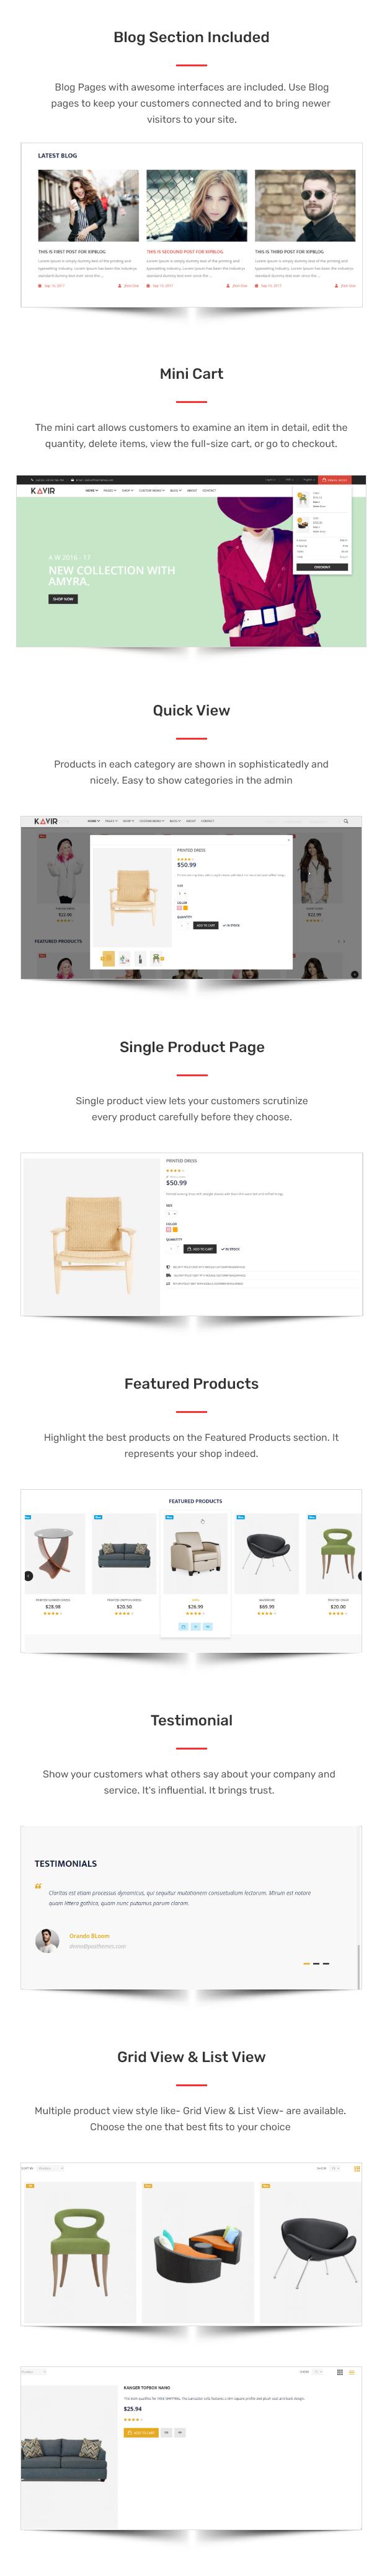 Kavir - eCommerce HTML Template - 2